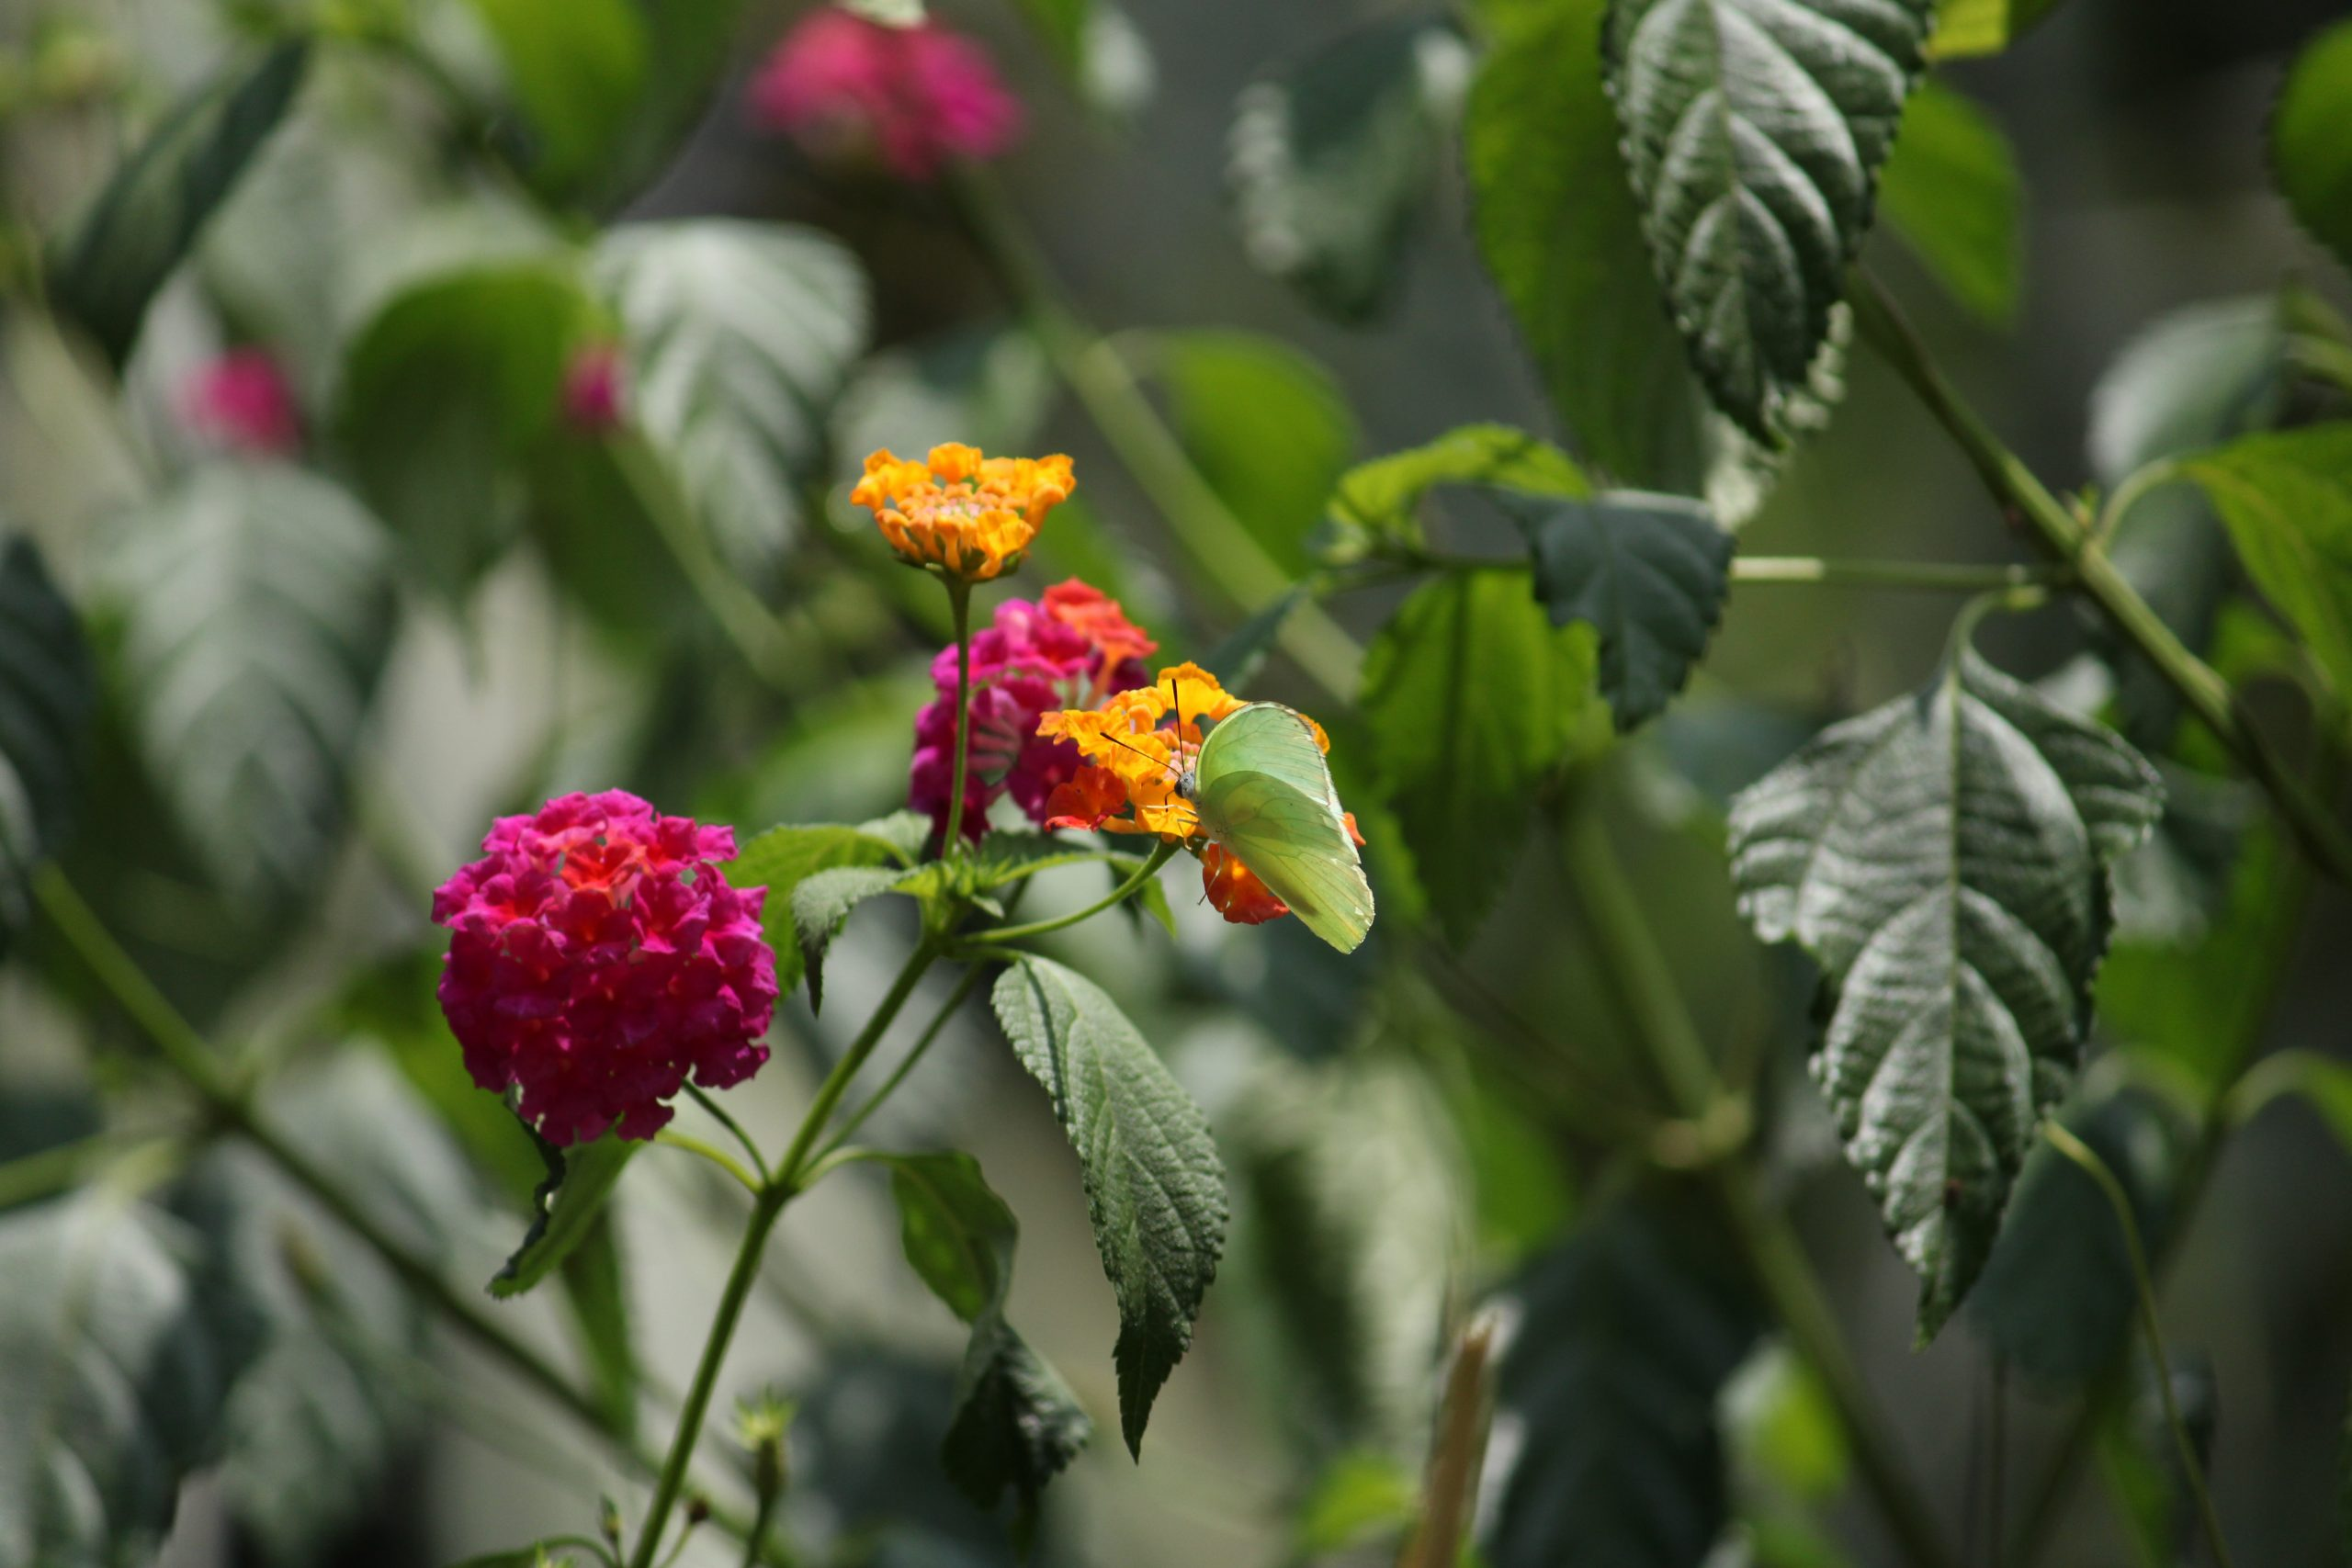 Aesthetic flowers.